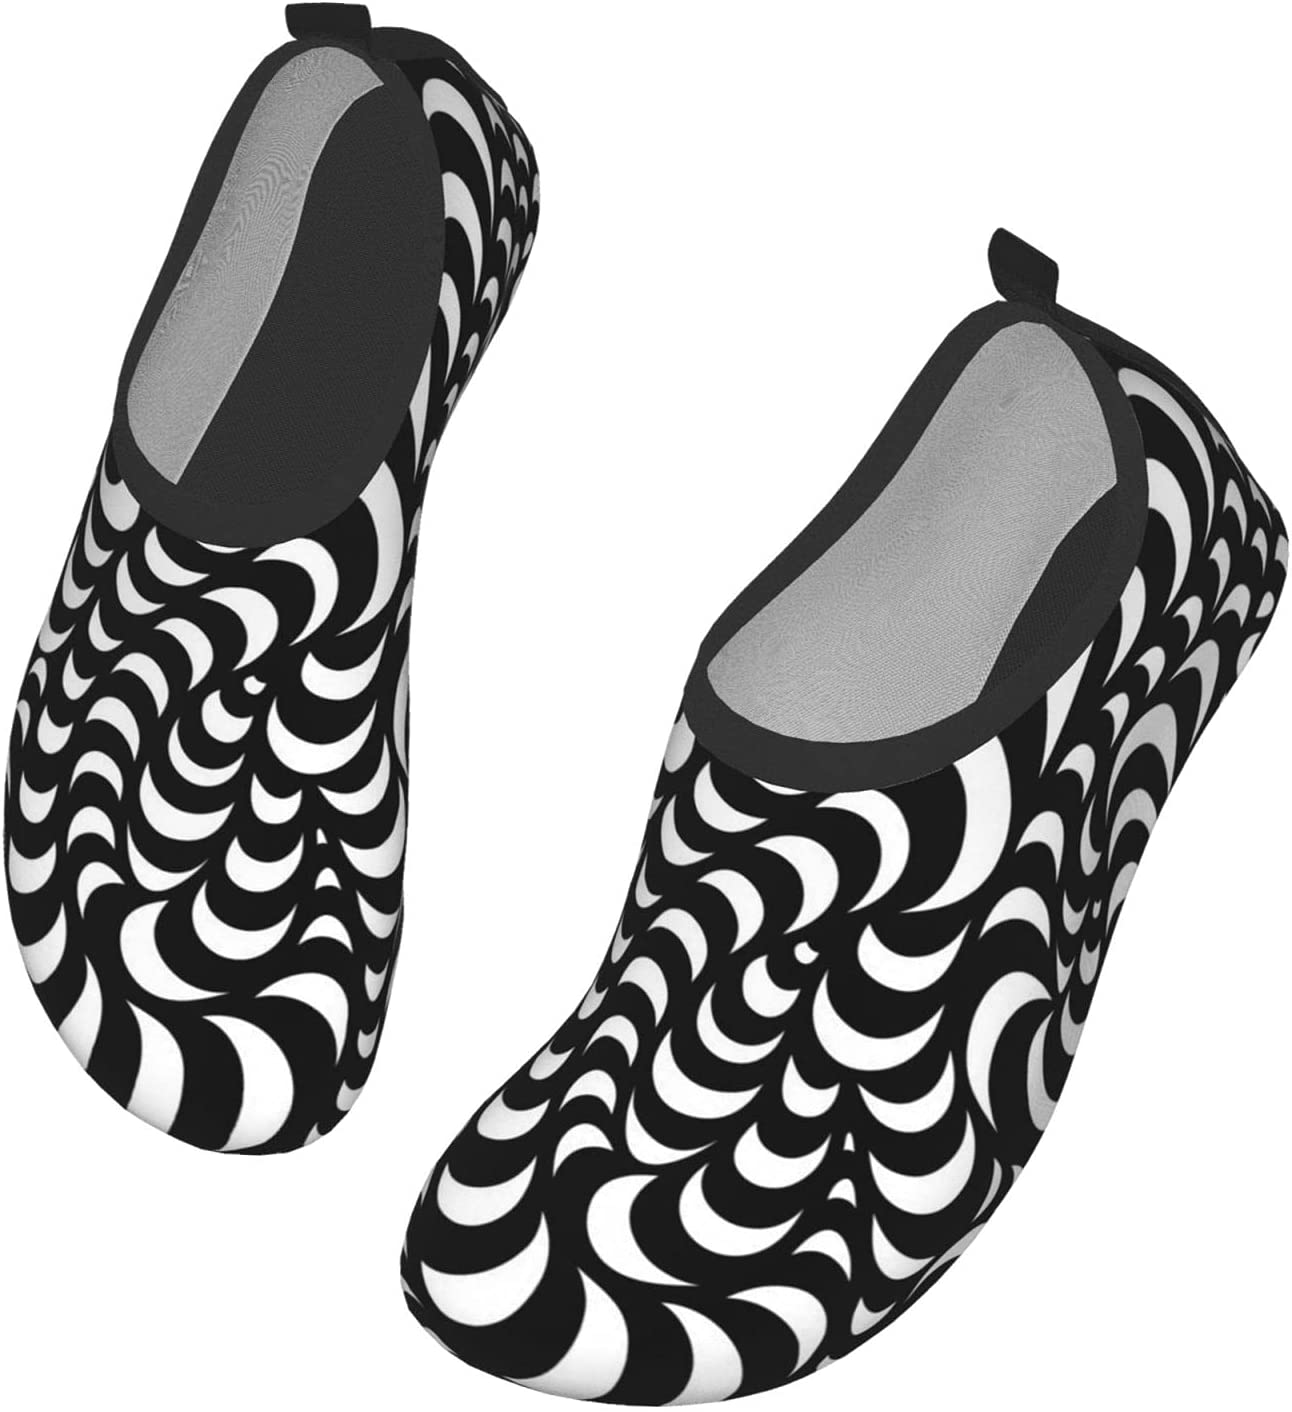 NA Black White Pattern Men's Women's Water Shoes Barefoot Quick Dry Slip-On Aqua Socks for Yoga Beach Sports Swim Surf